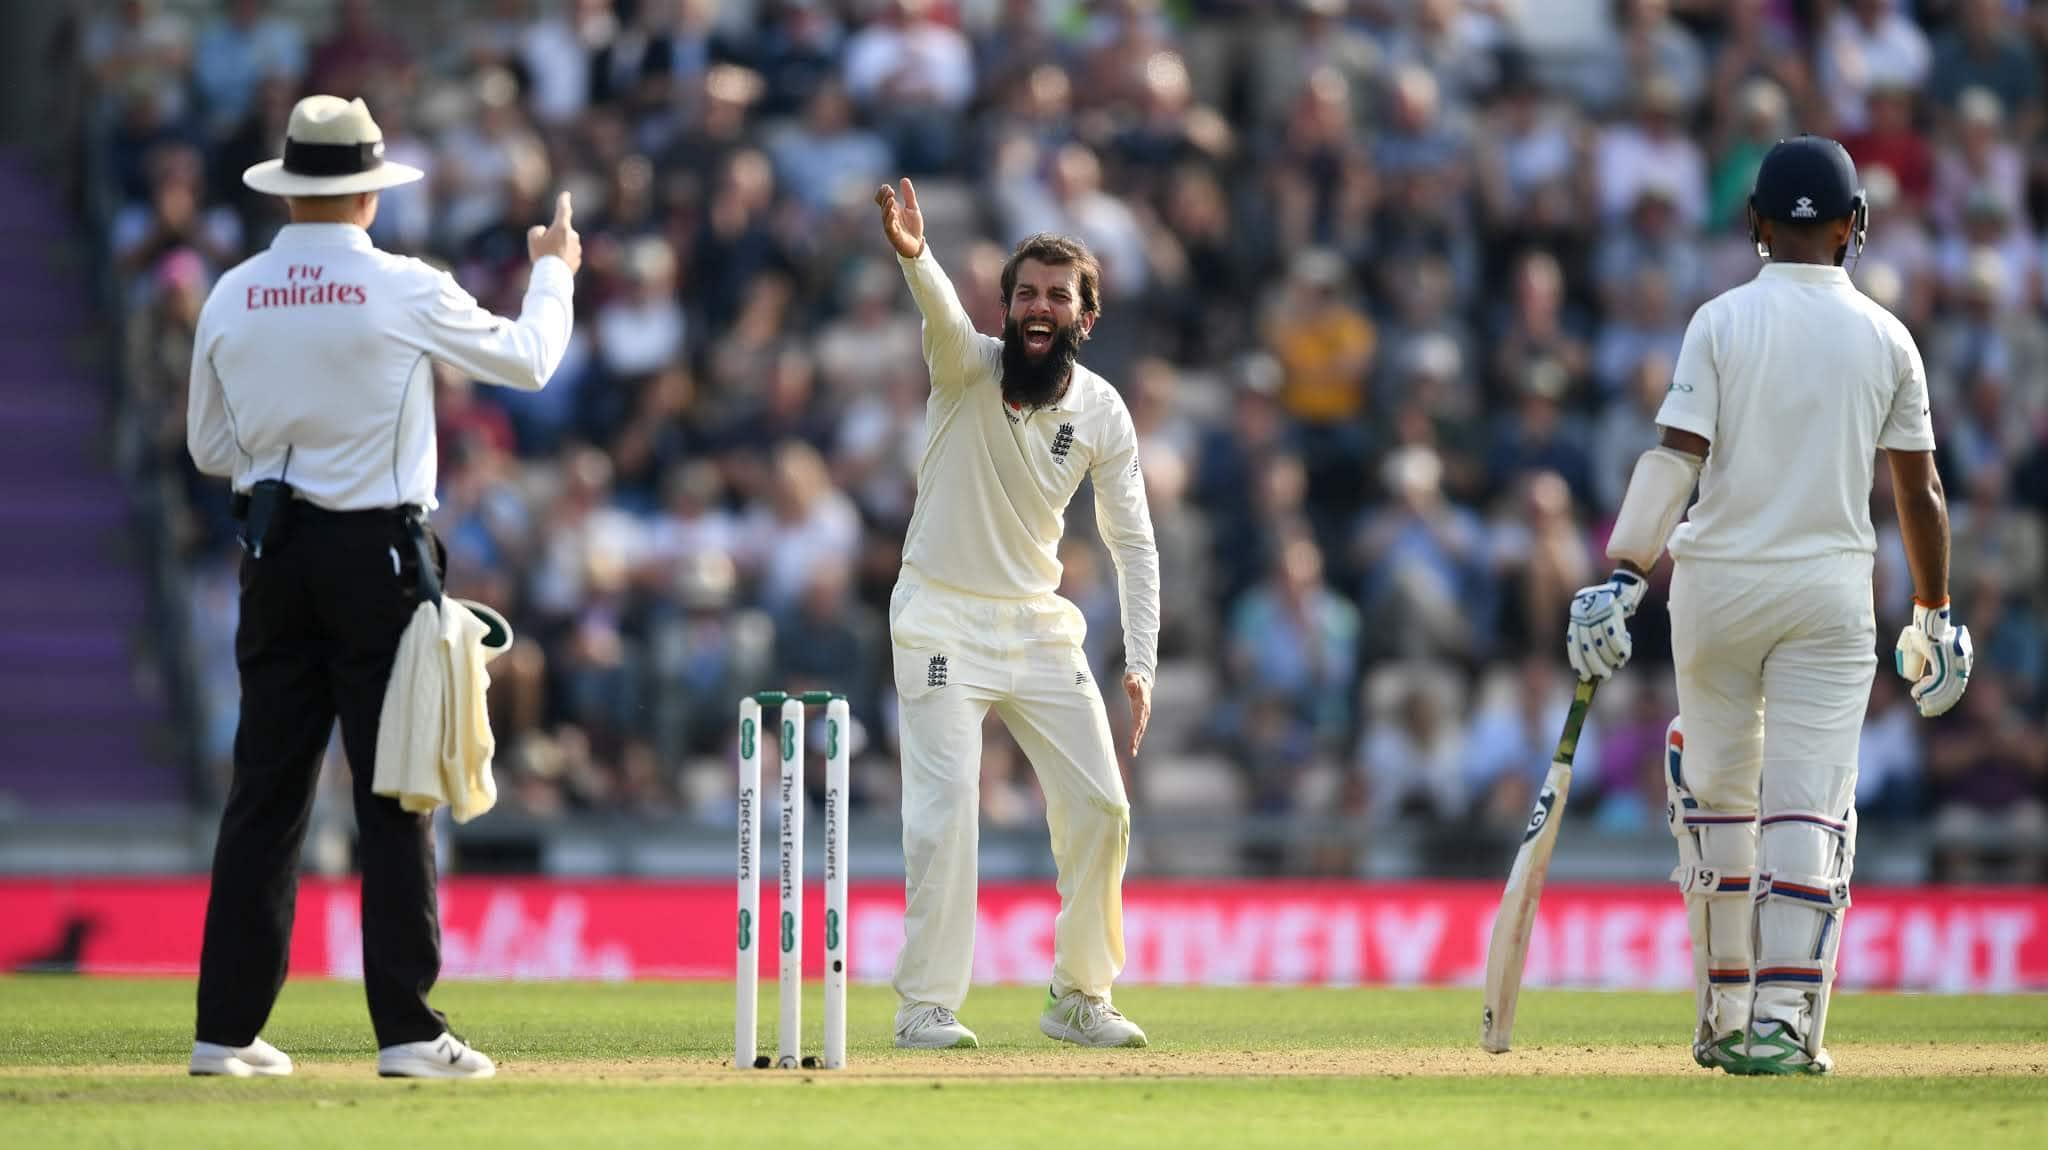 Sri Lanka vs England, 1st test: Moeen Ali, Jack Leach share seven wickets; England beat Sri Lanka by 211 runs